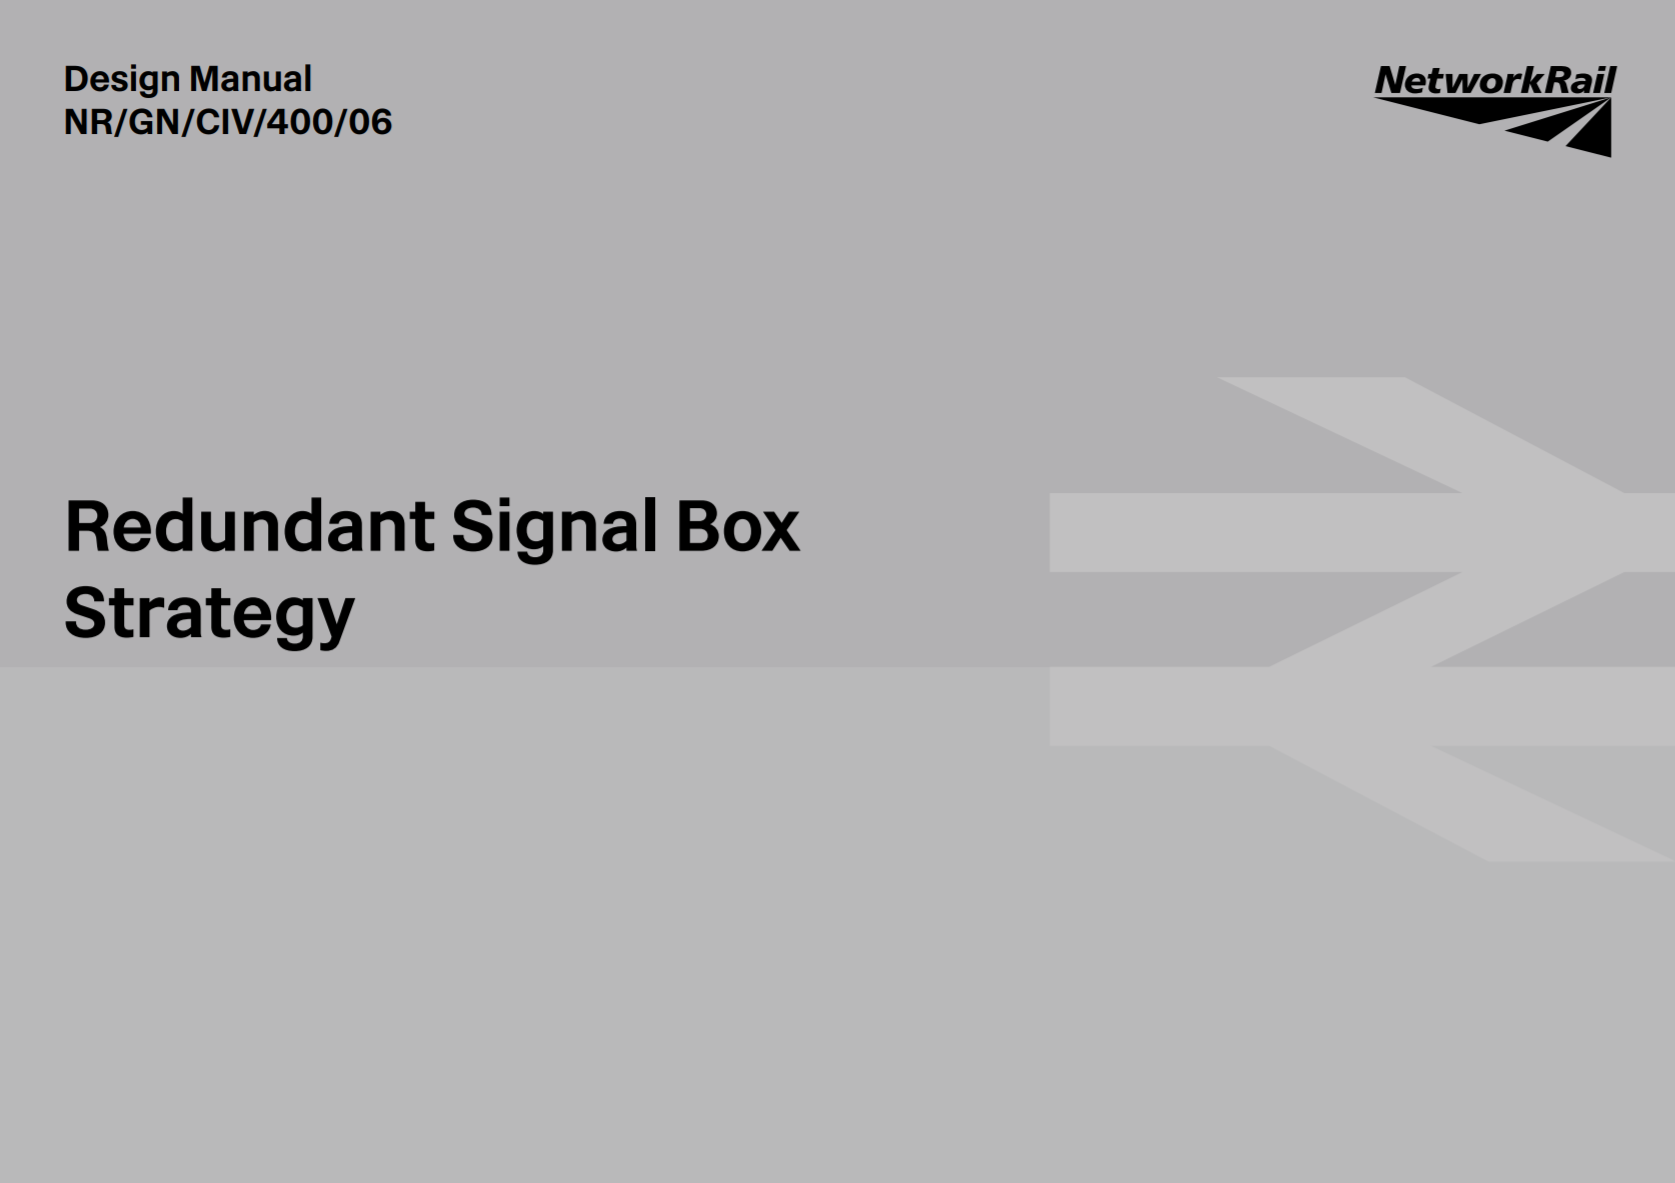 Redundant Signal Box Strategy